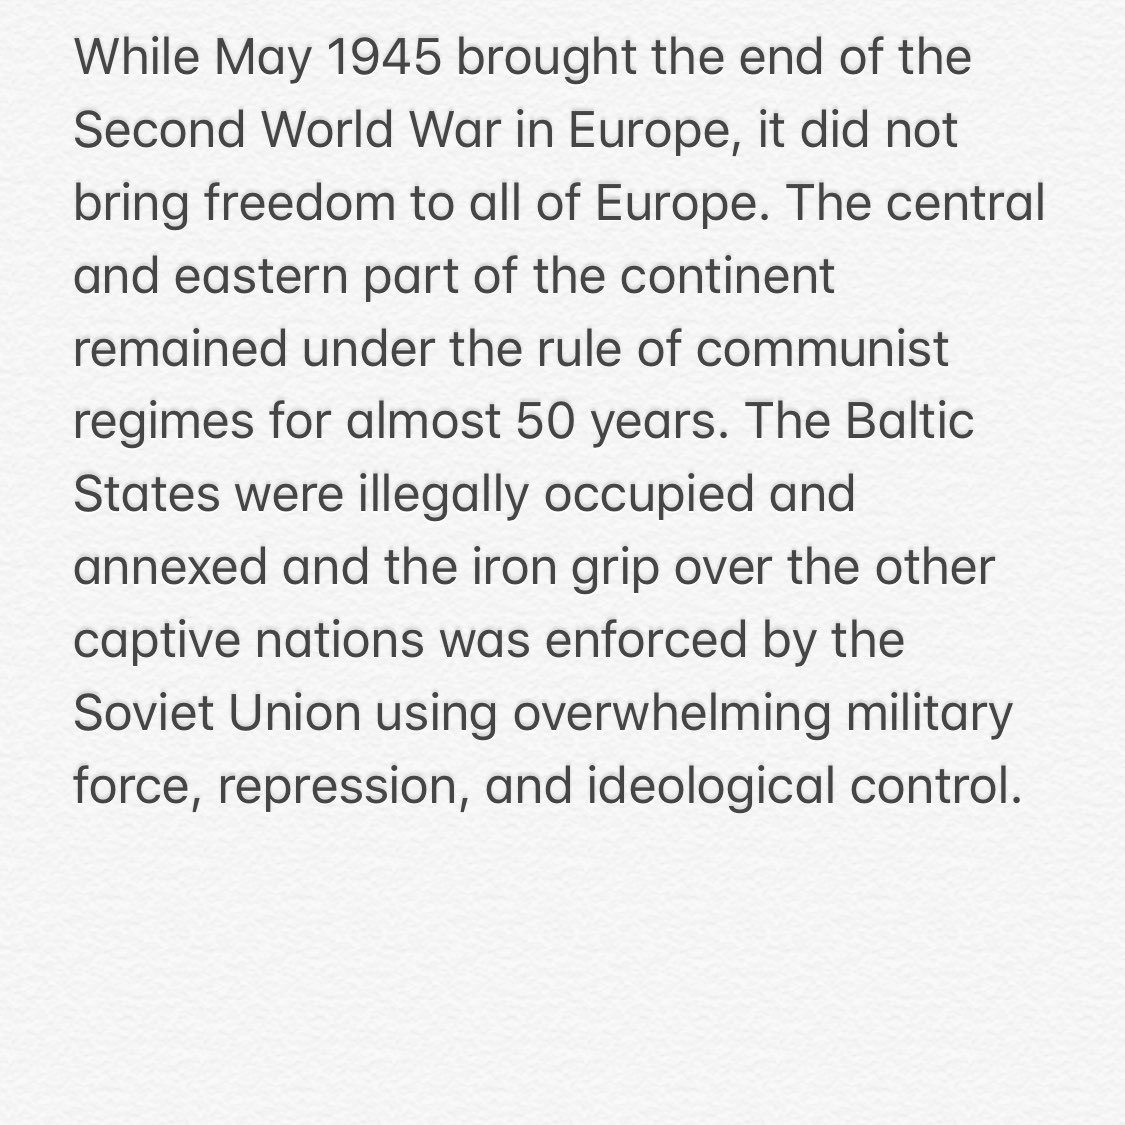 Read our Statement on the 75th Anniversary of the End of the Second World War  @SecPompeo @EZaharievaMFA @UrmasReinsalu @TPetricek @LinkeviciusL @BogdanAurescu @IvanKorcok #Czaputowicz #Szijarto 👉 https://t.co/bDg9ensTk3  🇧🇬 🇨🇿 🇪🇪 🇭🇺  🇱🇻 🇱🇹 🇵🇱 🇷🇴 🇸🇰 🇺🇸 https://t.co/SjEWkuNABk